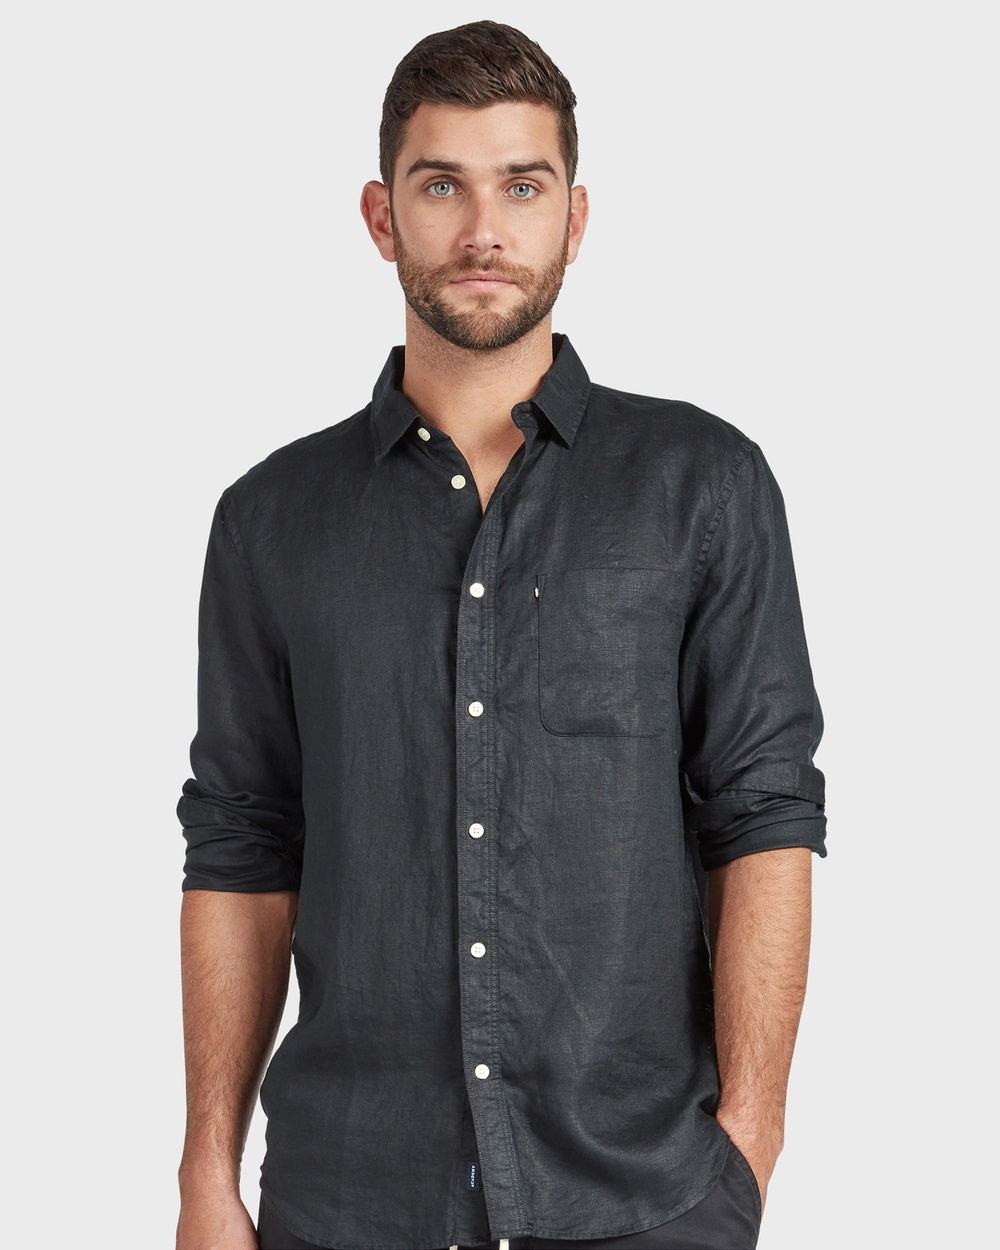 Academy Brand Hampton L S Linen Shirt Shirts & Polos Black L-S